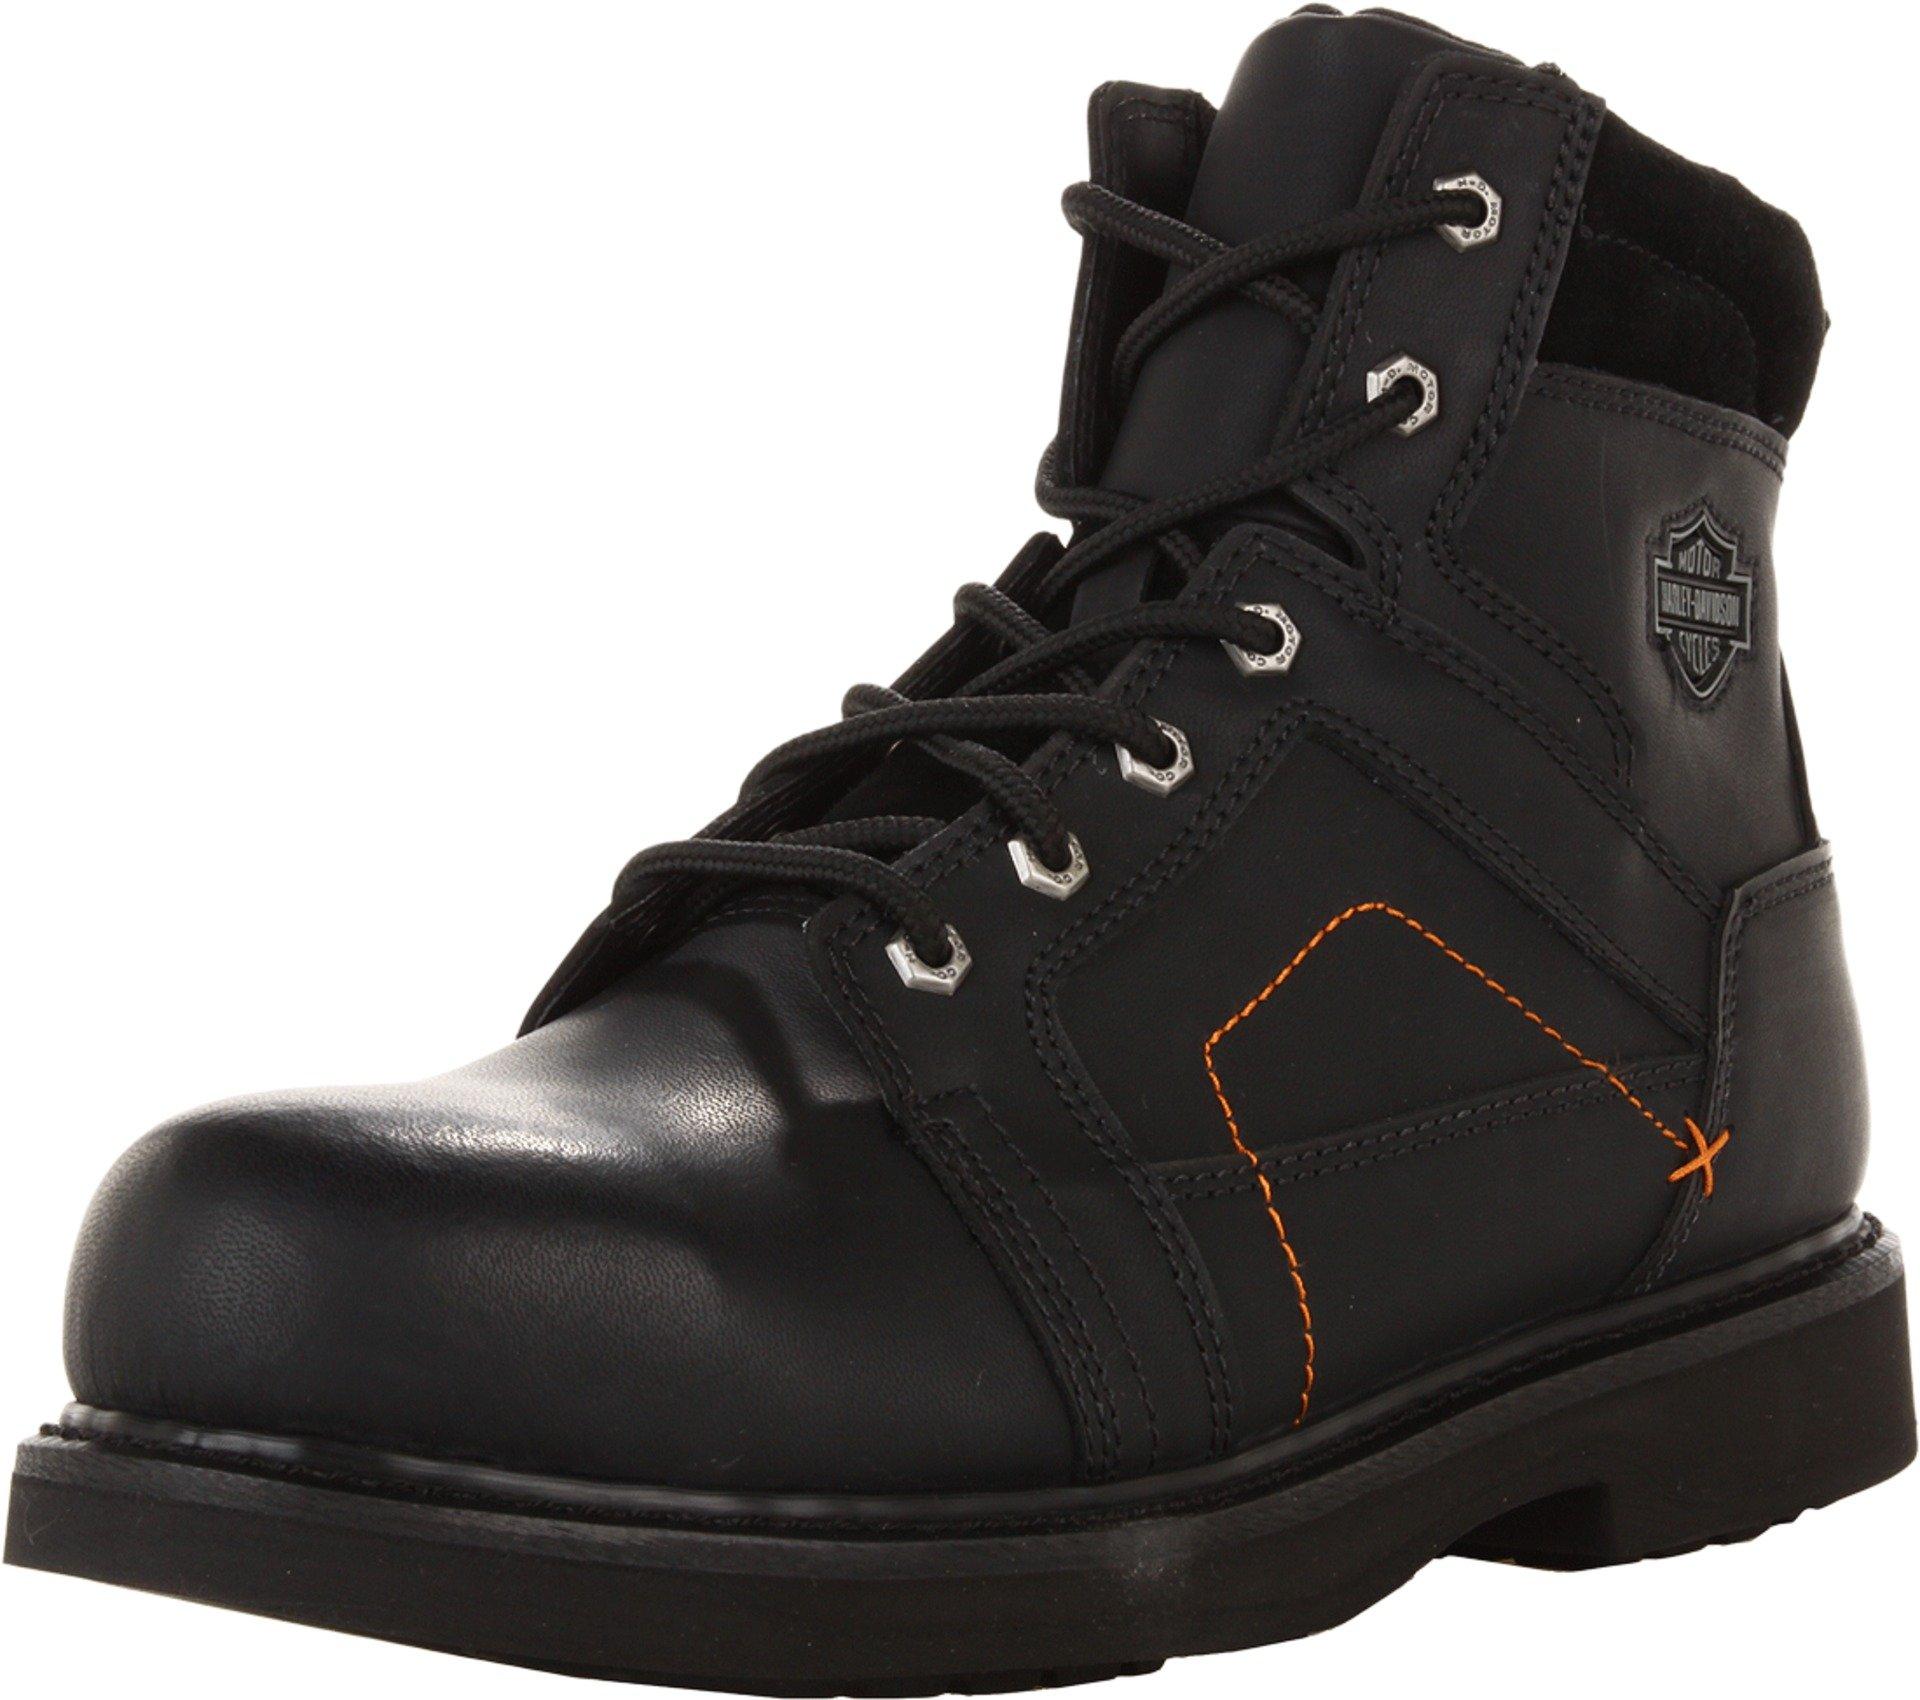 Harley-Davidson Men's Pete Steel Toe Motorcycle Safety Boot, Black, 9.5 M US by Harley-Davidson